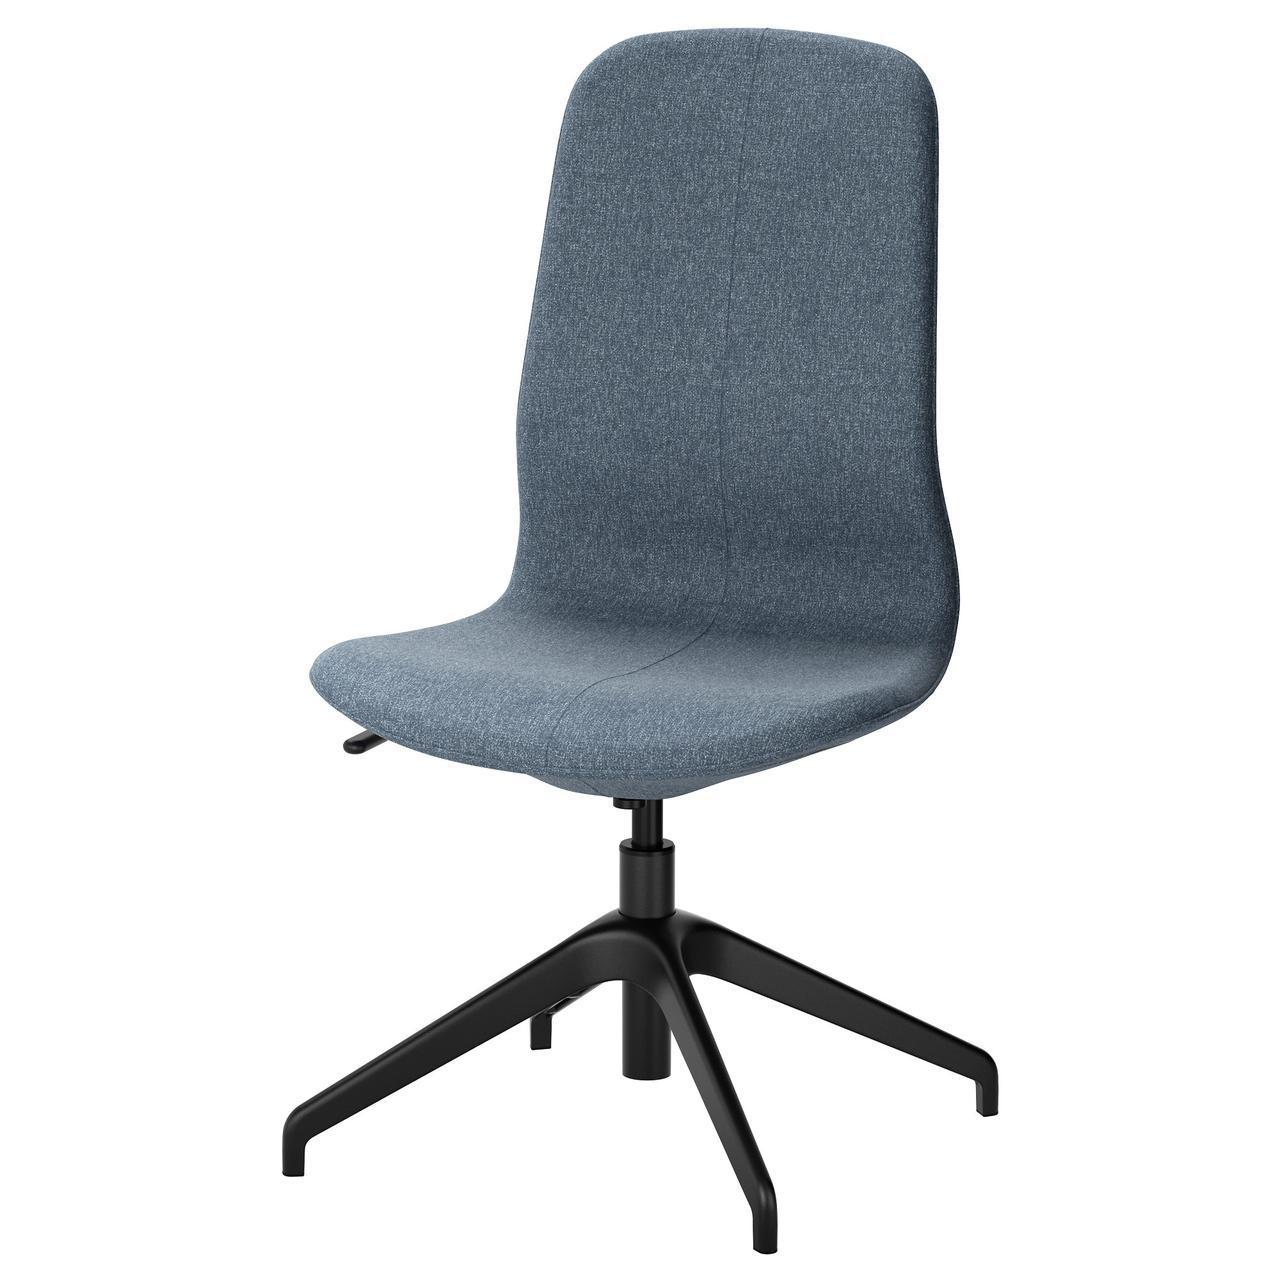 Комп'ютерне крісло IKEA LÅNGFJÄLL Gunnared блакитне чорне 291.751.17